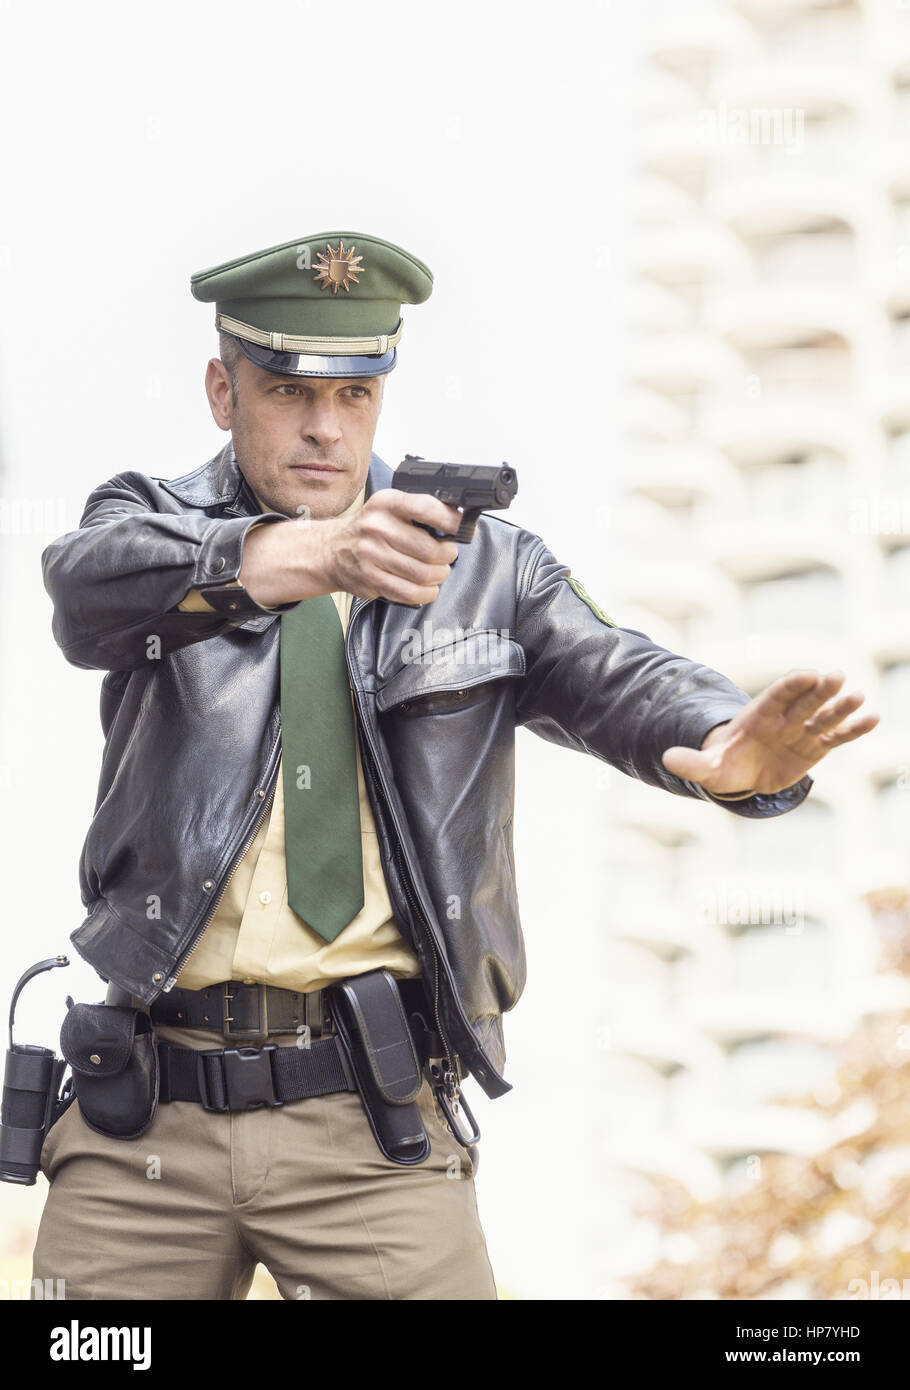 Polizist Bild